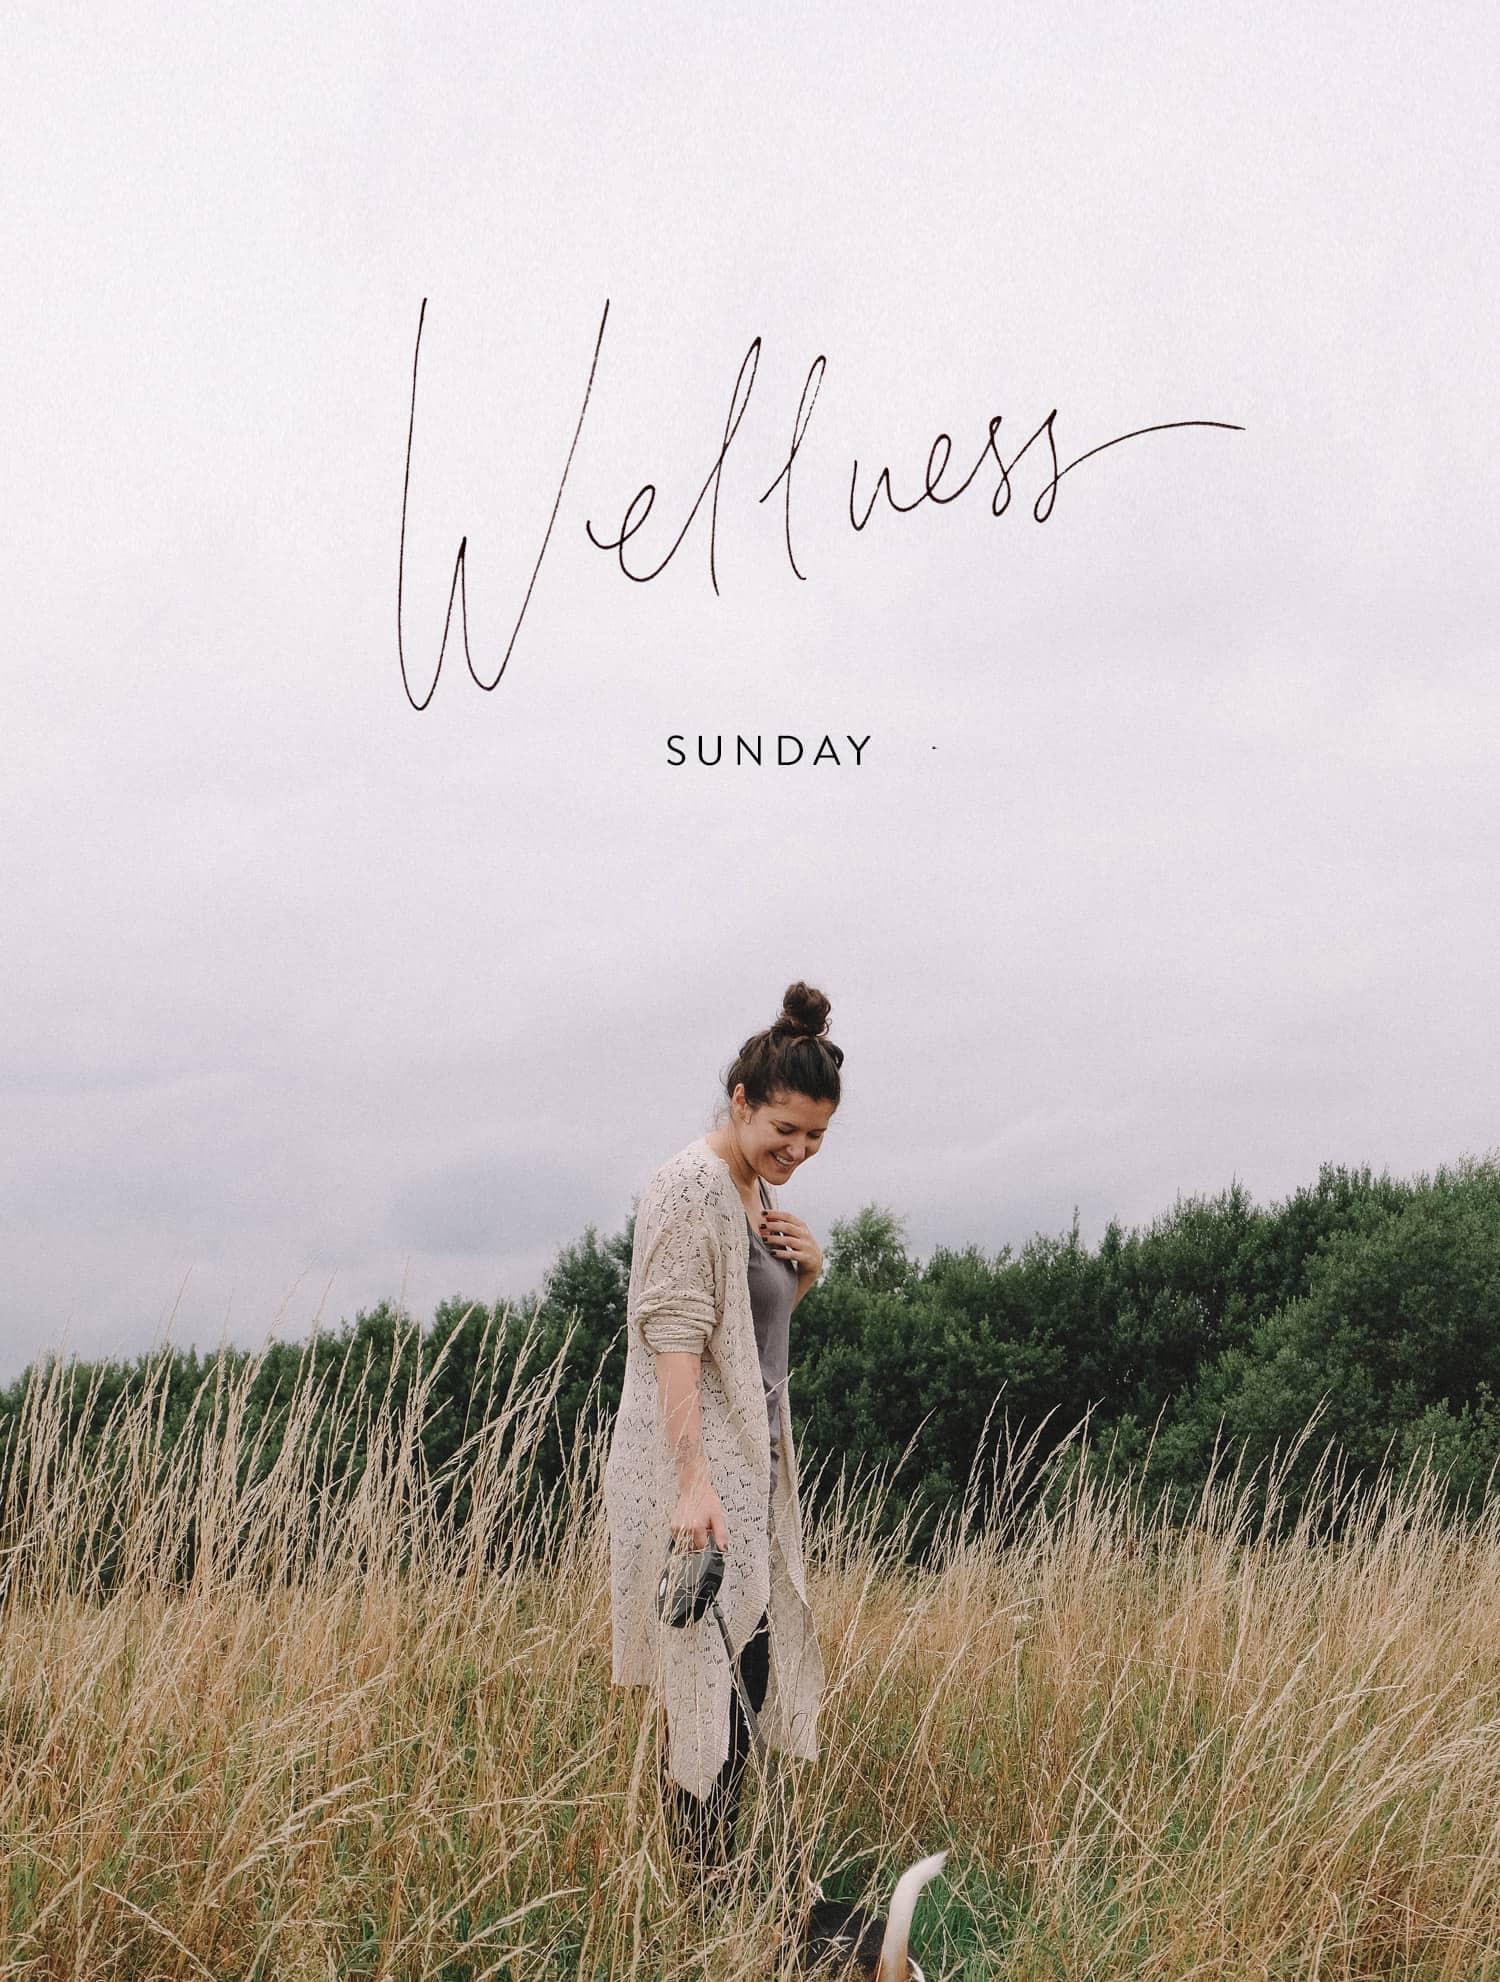 Kinlake-Wellness-Sunday-01